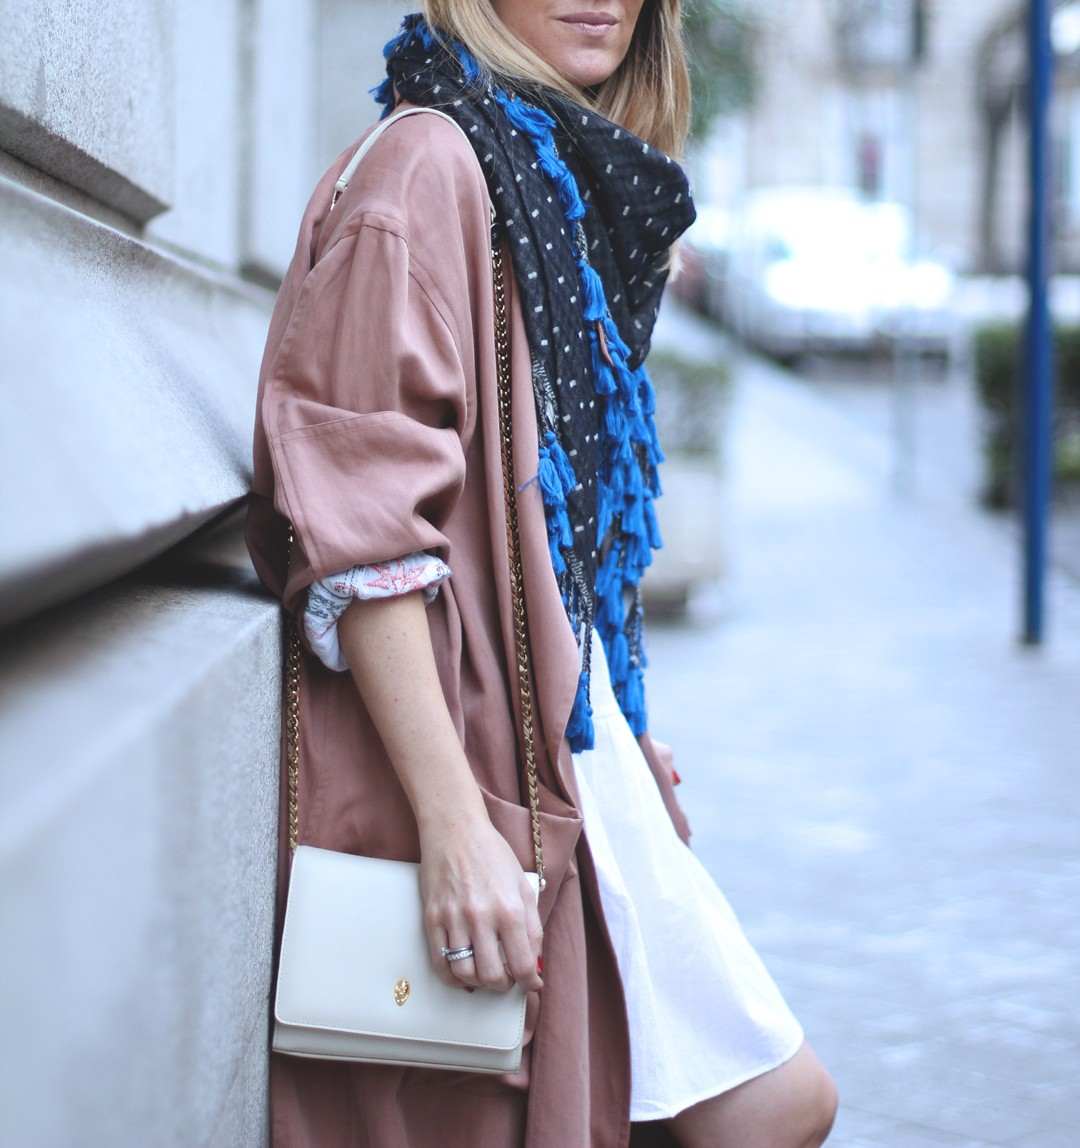 Ikks-Trench-Madrid-Fashion-Blogger